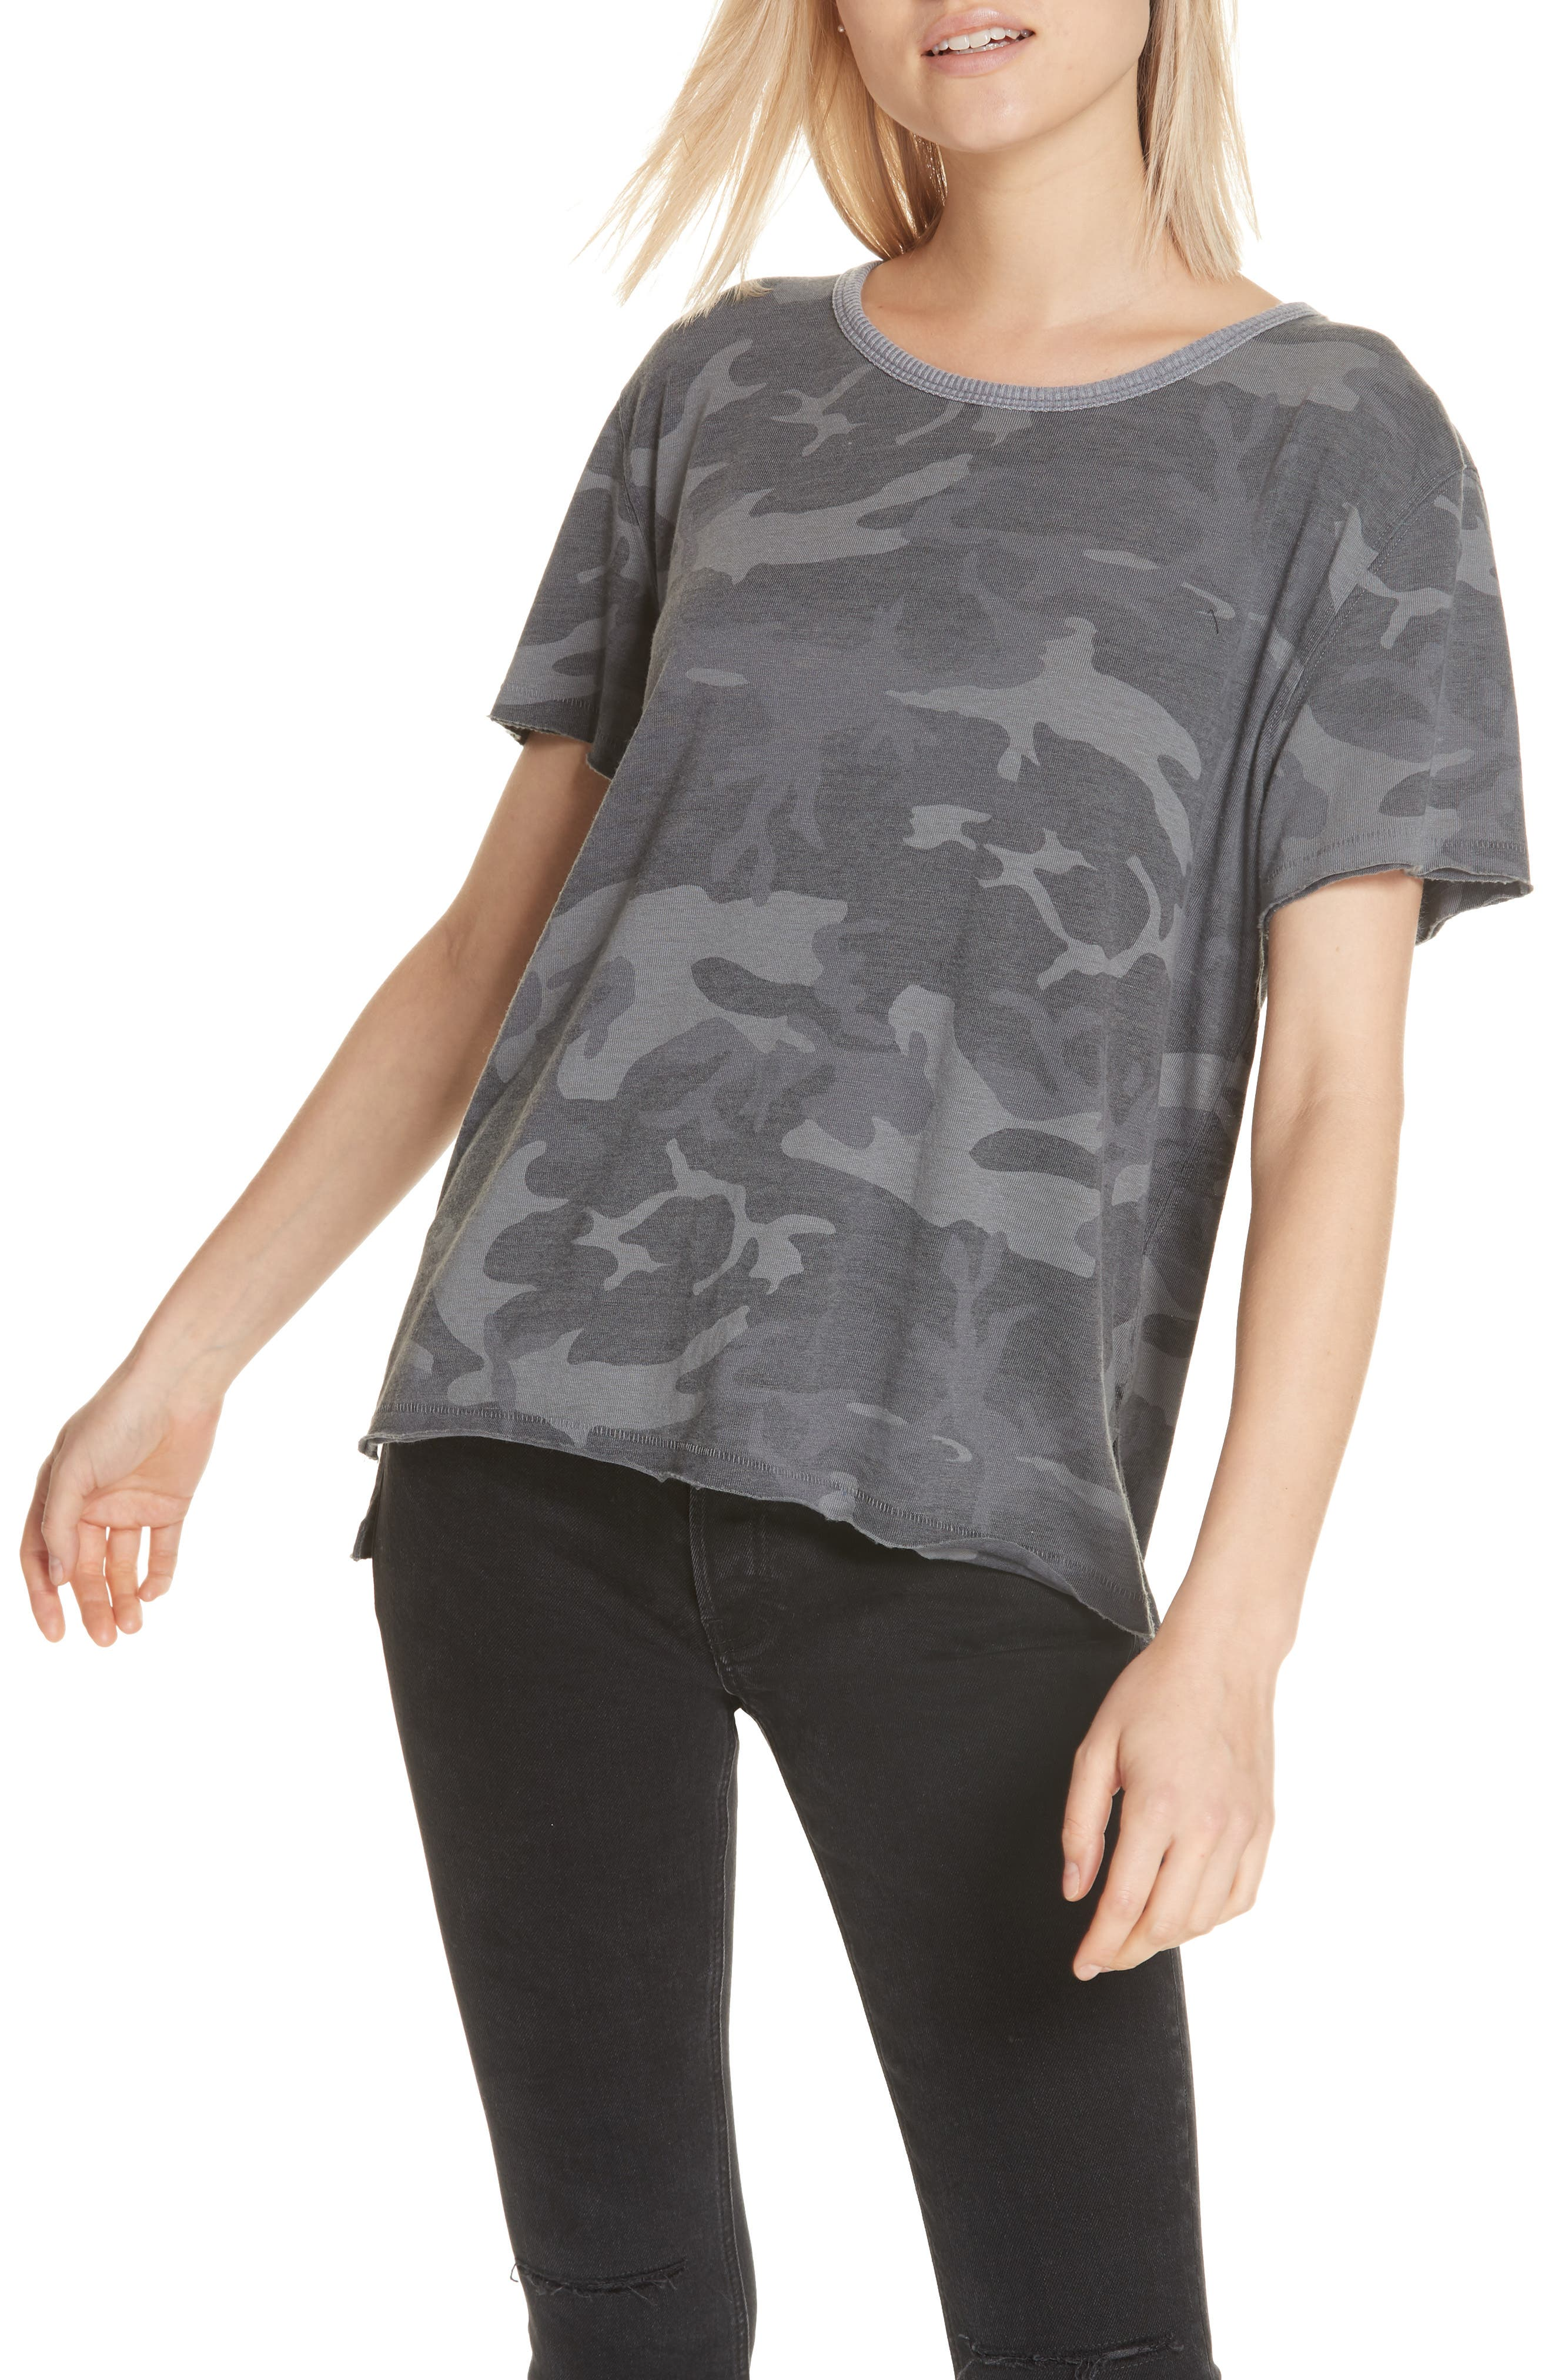 Camouflage Top Nordstrom Torch Tshirt Women Blue Black Navy M